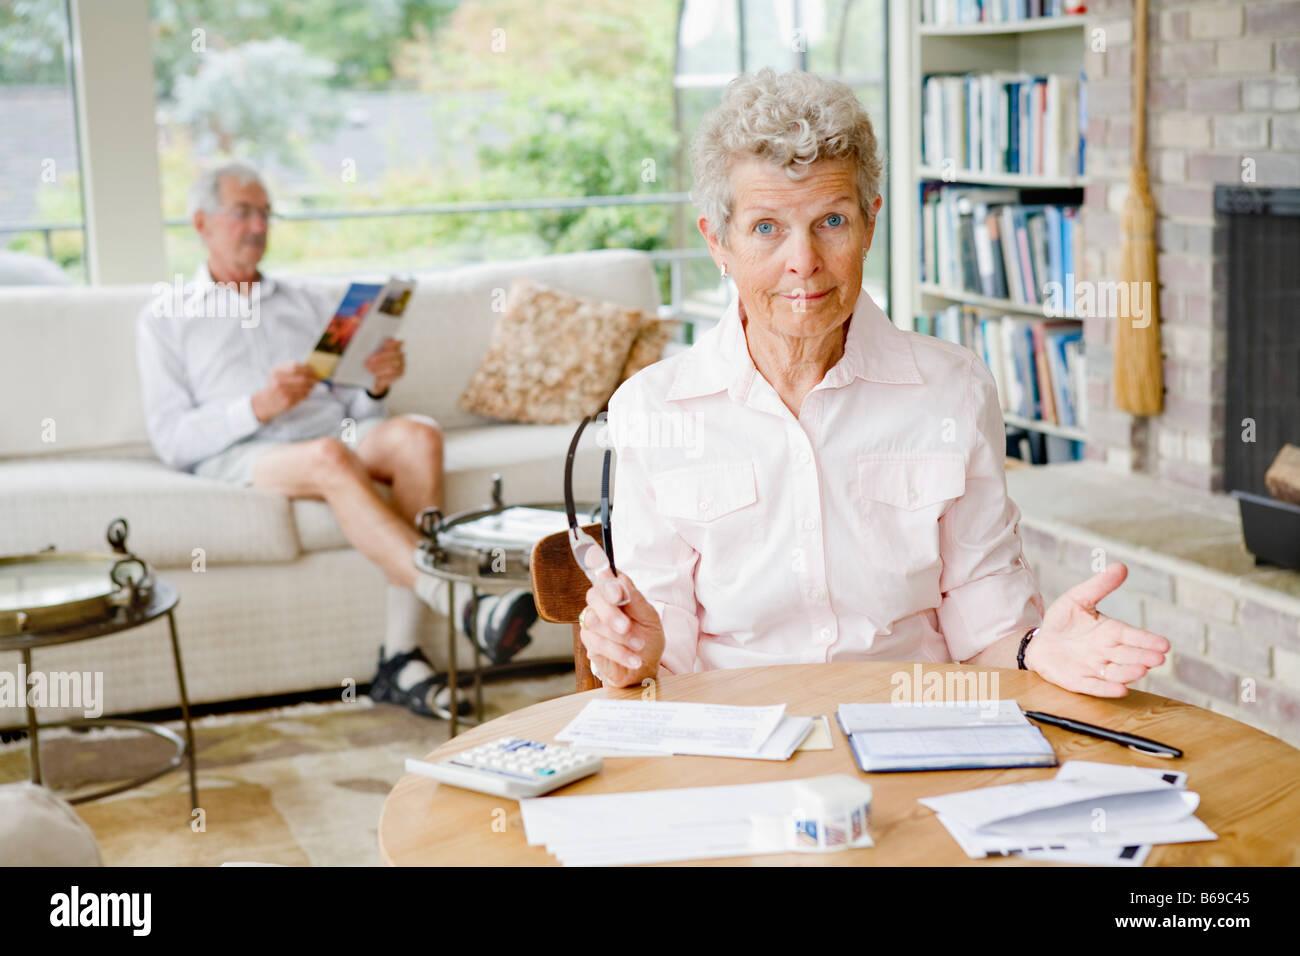 Woman preparing home finance budget - Stock Image